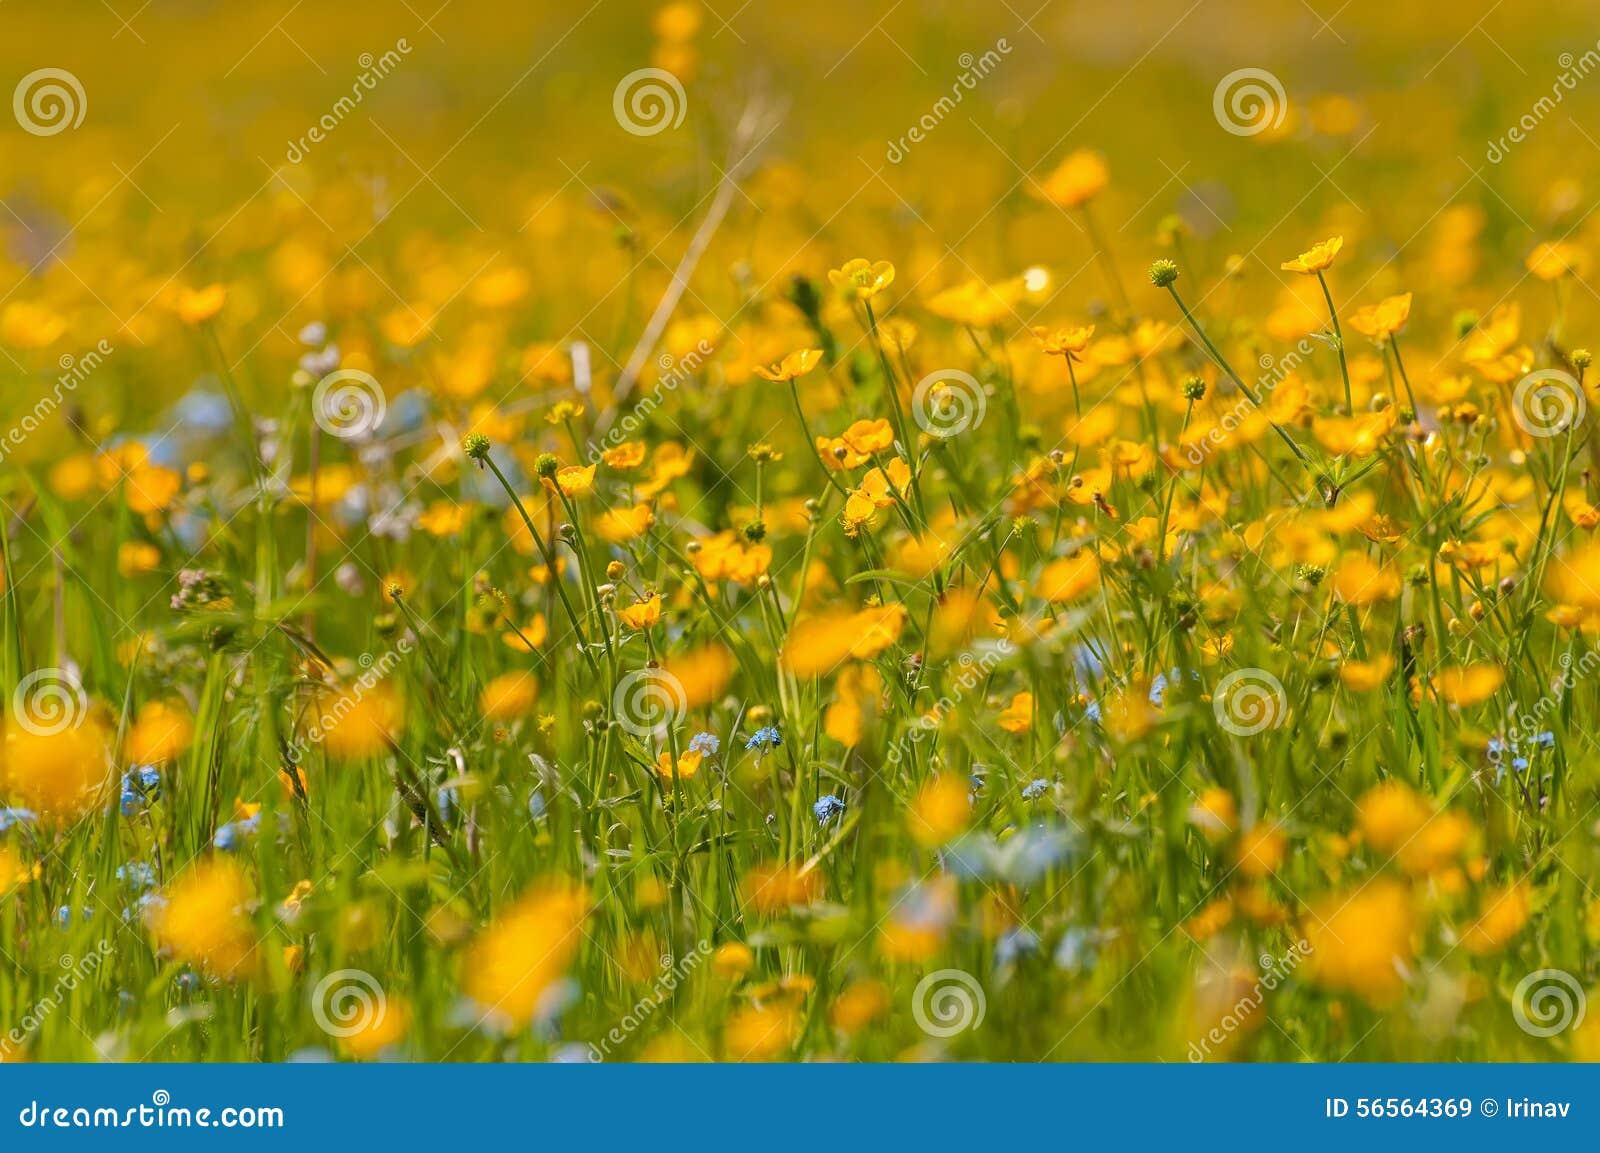 Download Λιβάδι λουλουδιών νεραγκουλών Στοκ Εικόνα - εικόνα από γραφικός, ανθίζοντας: 56564369